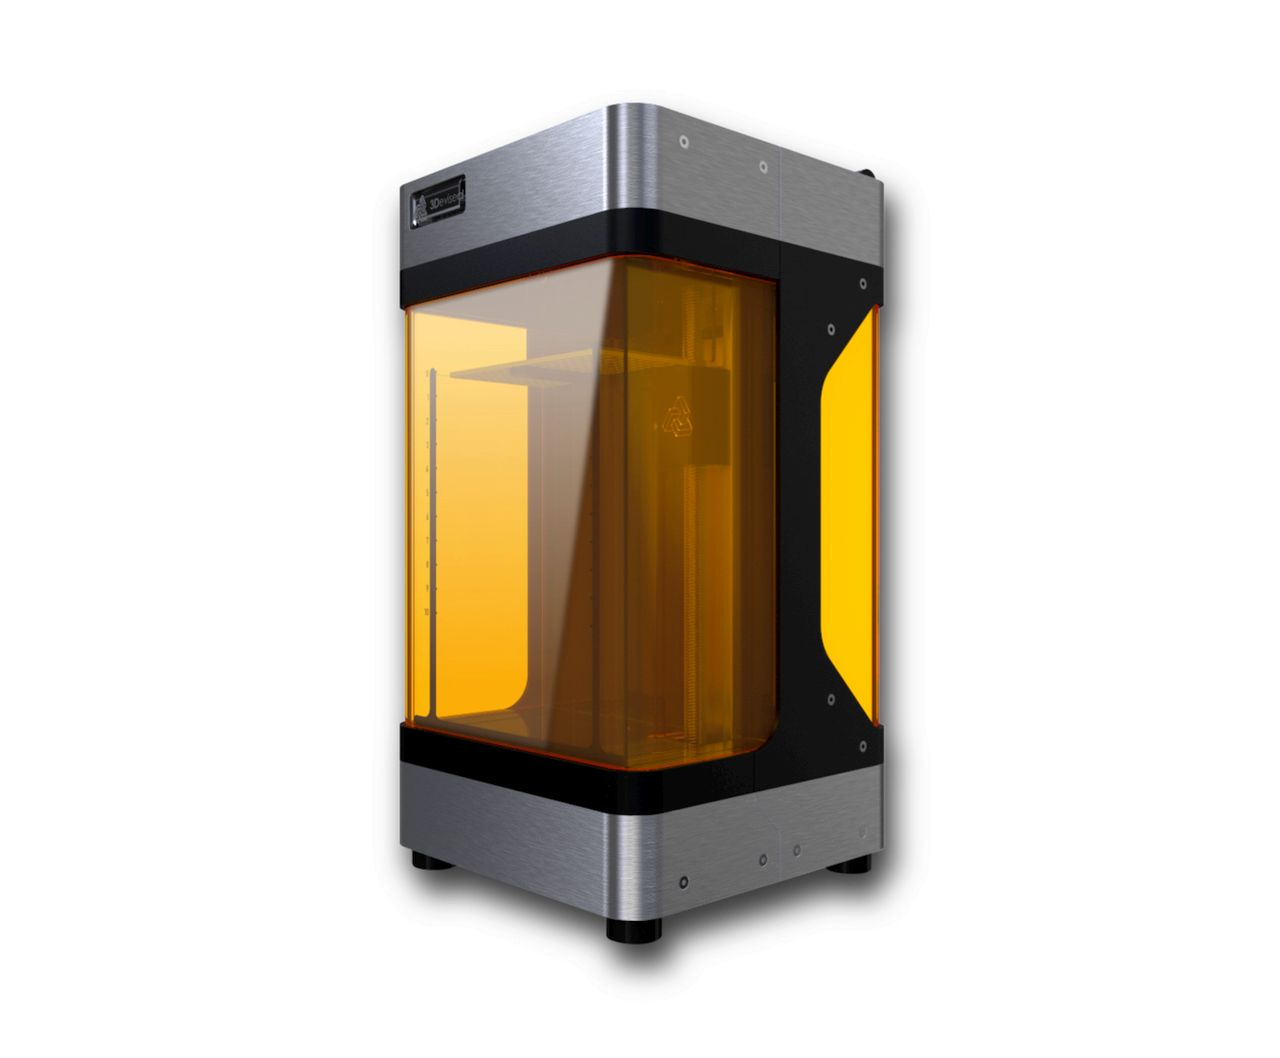 The new PLUTO desktop 3D printer